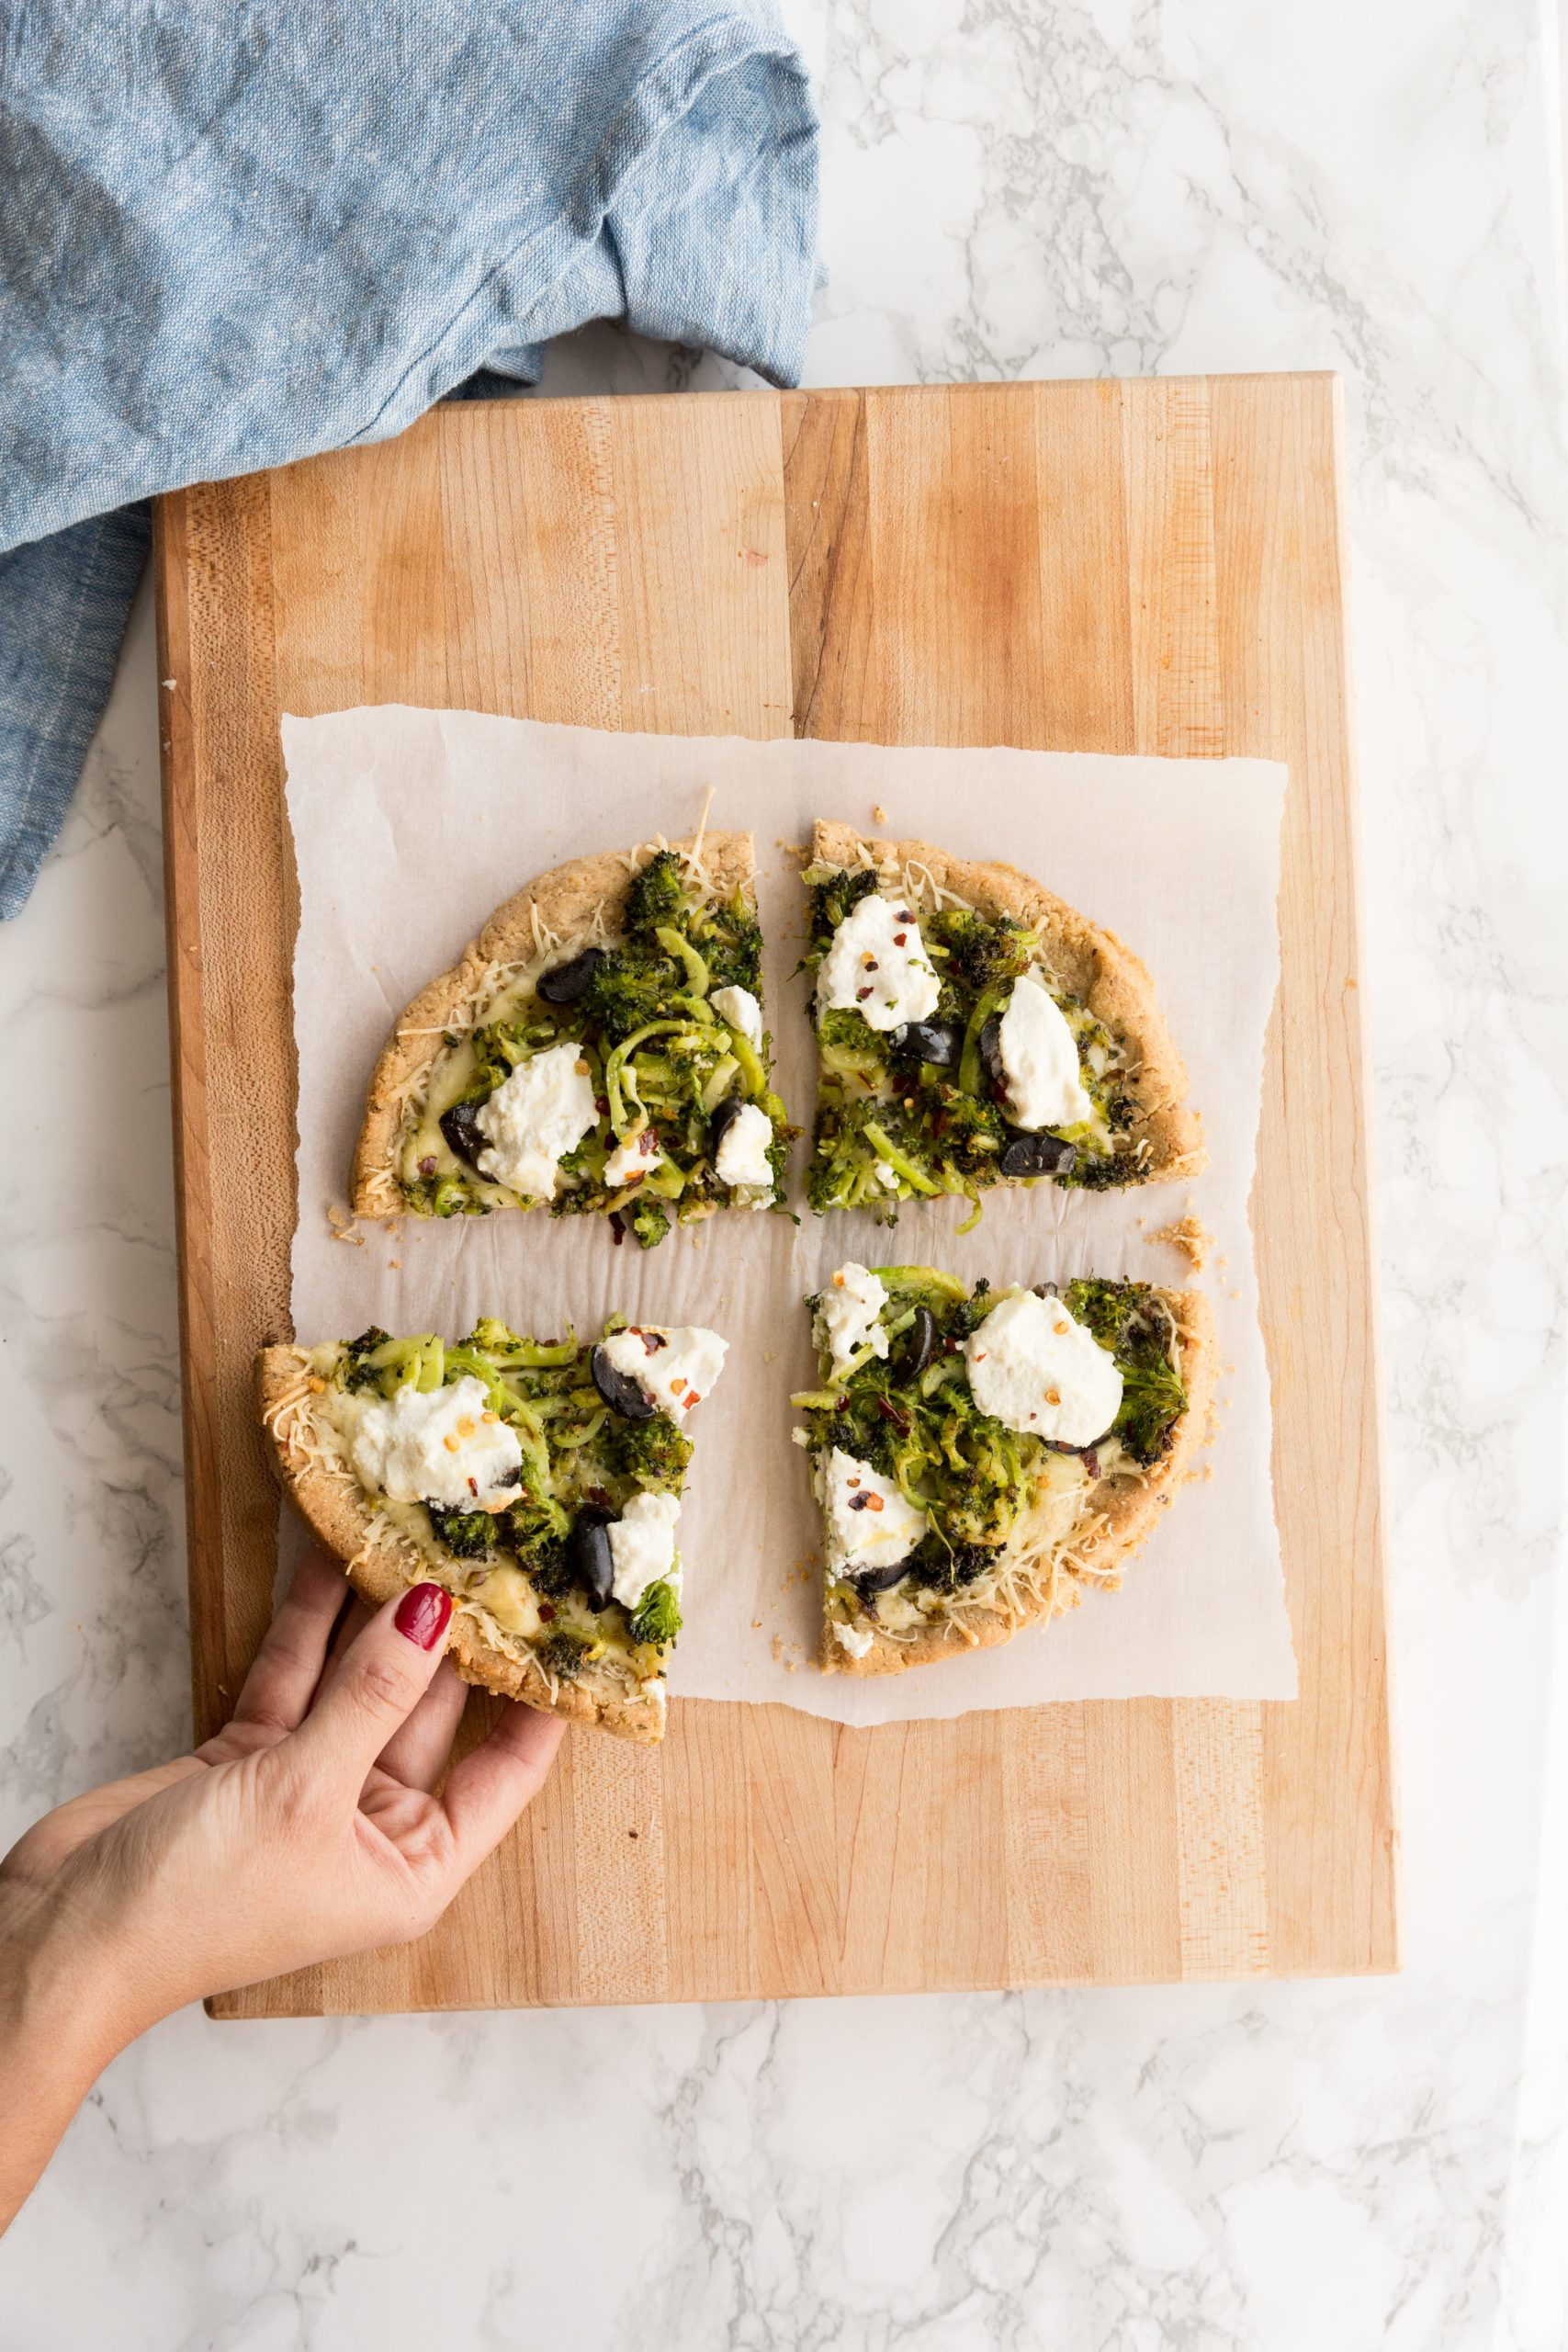 Spiralized Broccoli and Olive Bianca Pizza